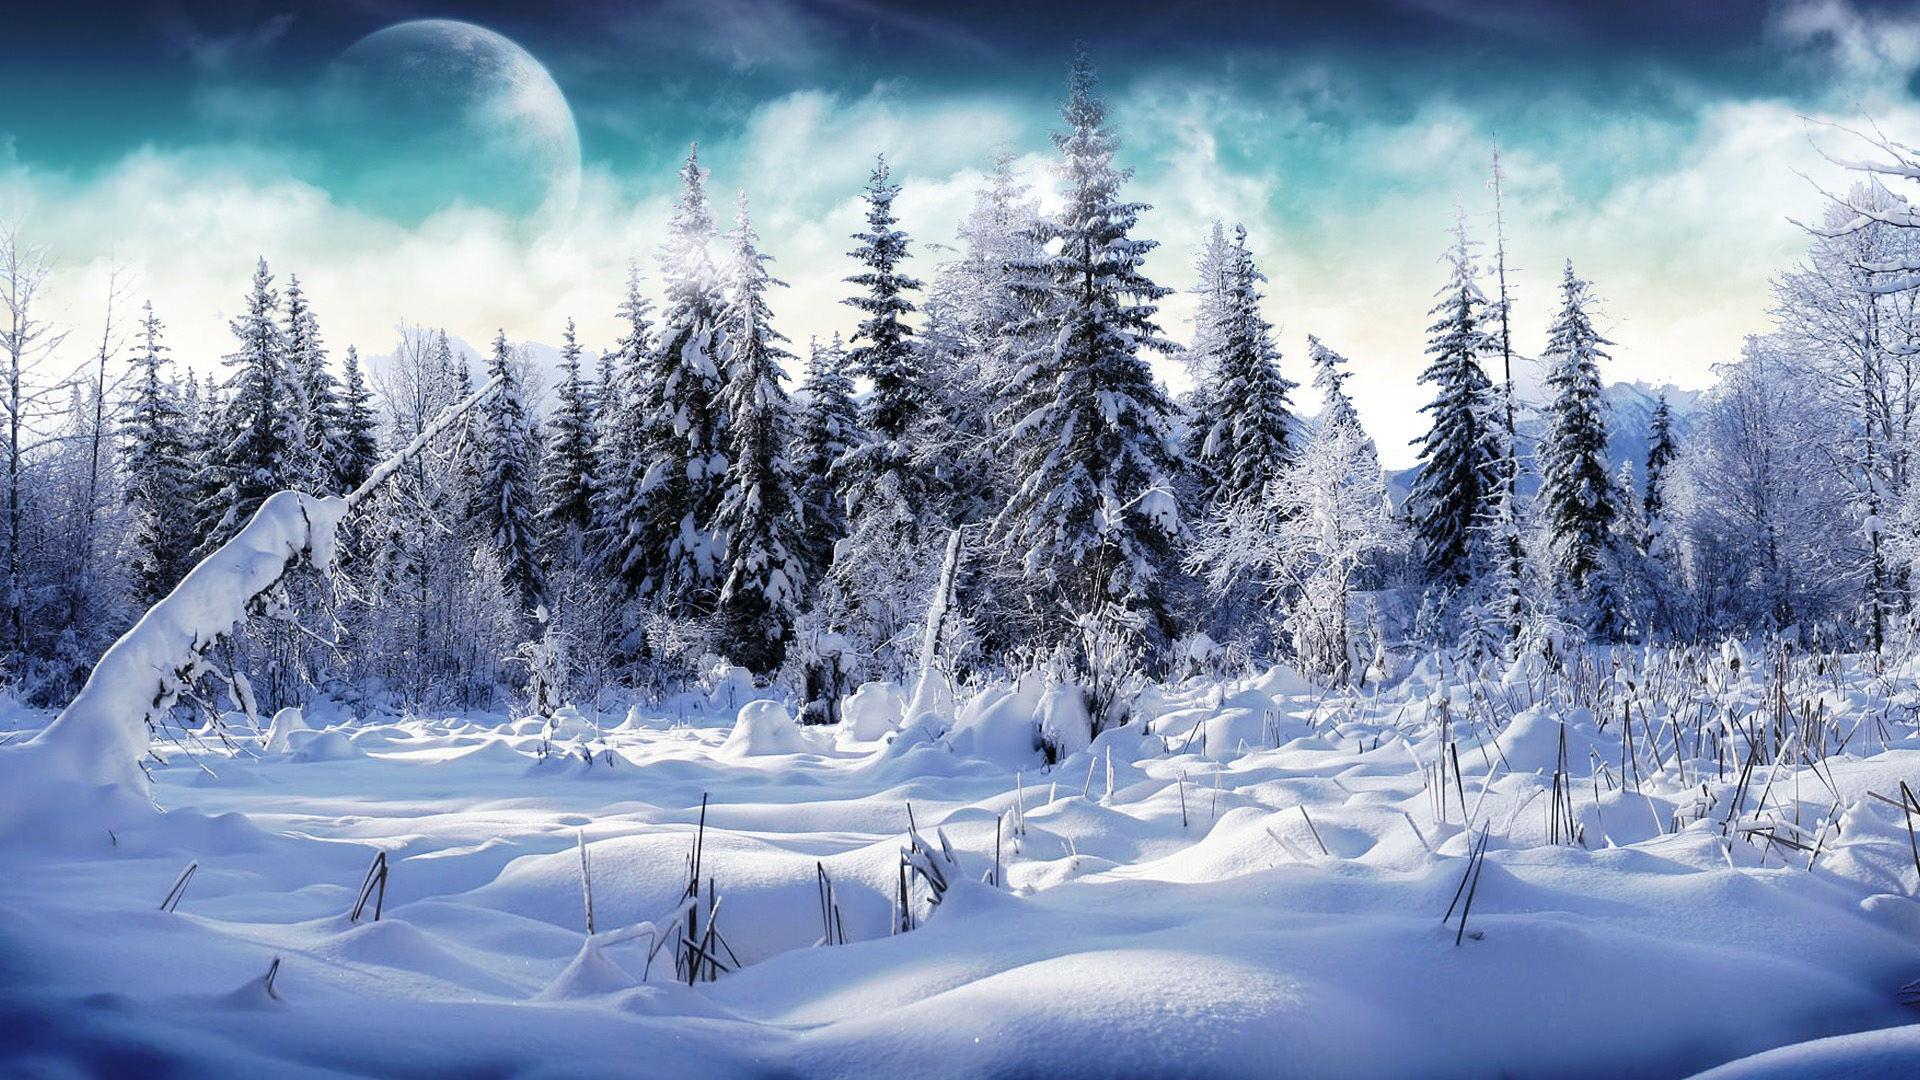 HD Snow Wallpaper For Laptop